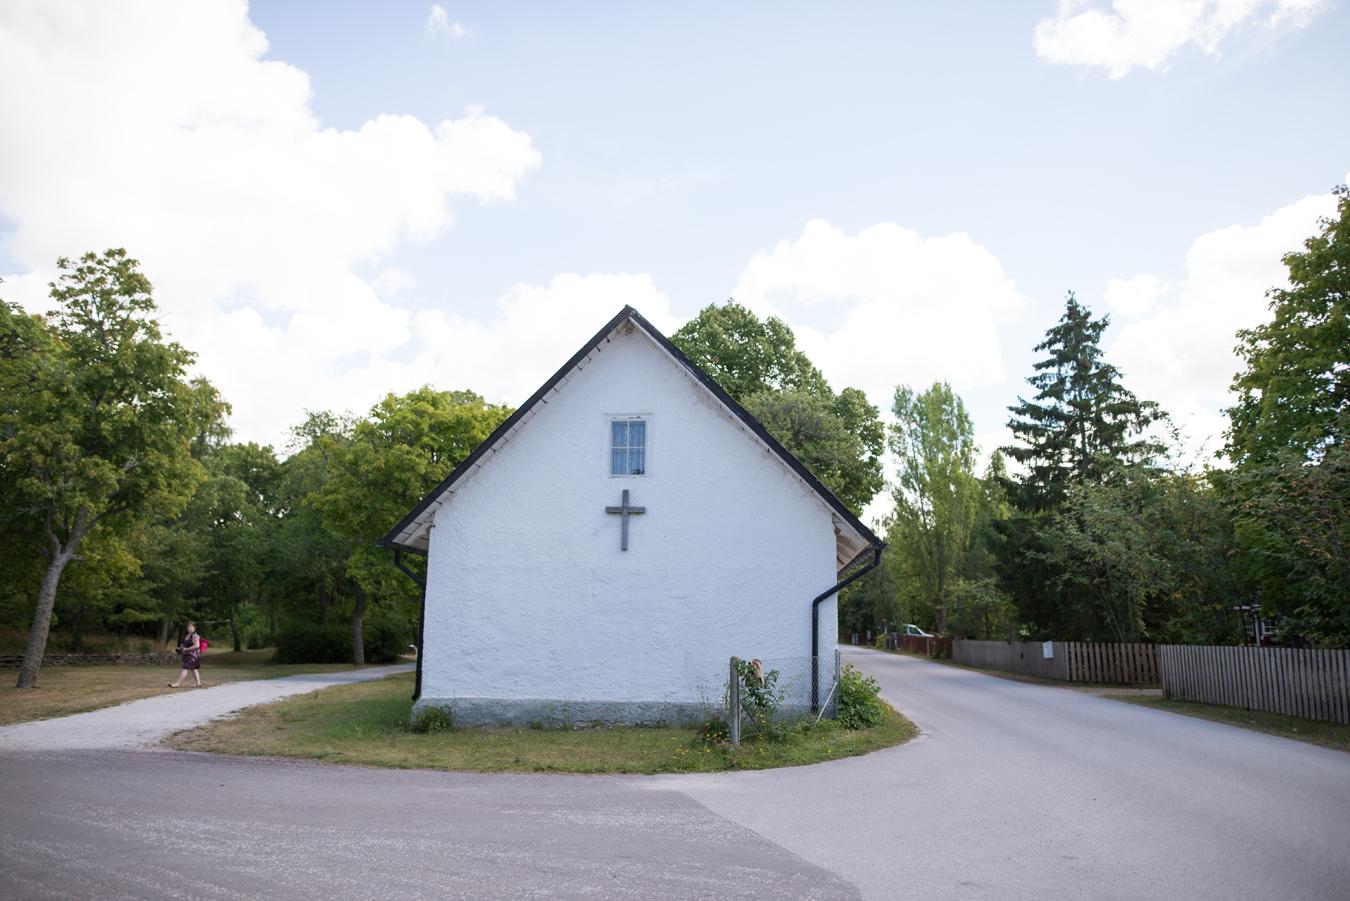 019-bröllop-gotland-fridhem-neas-fotografi.jpg